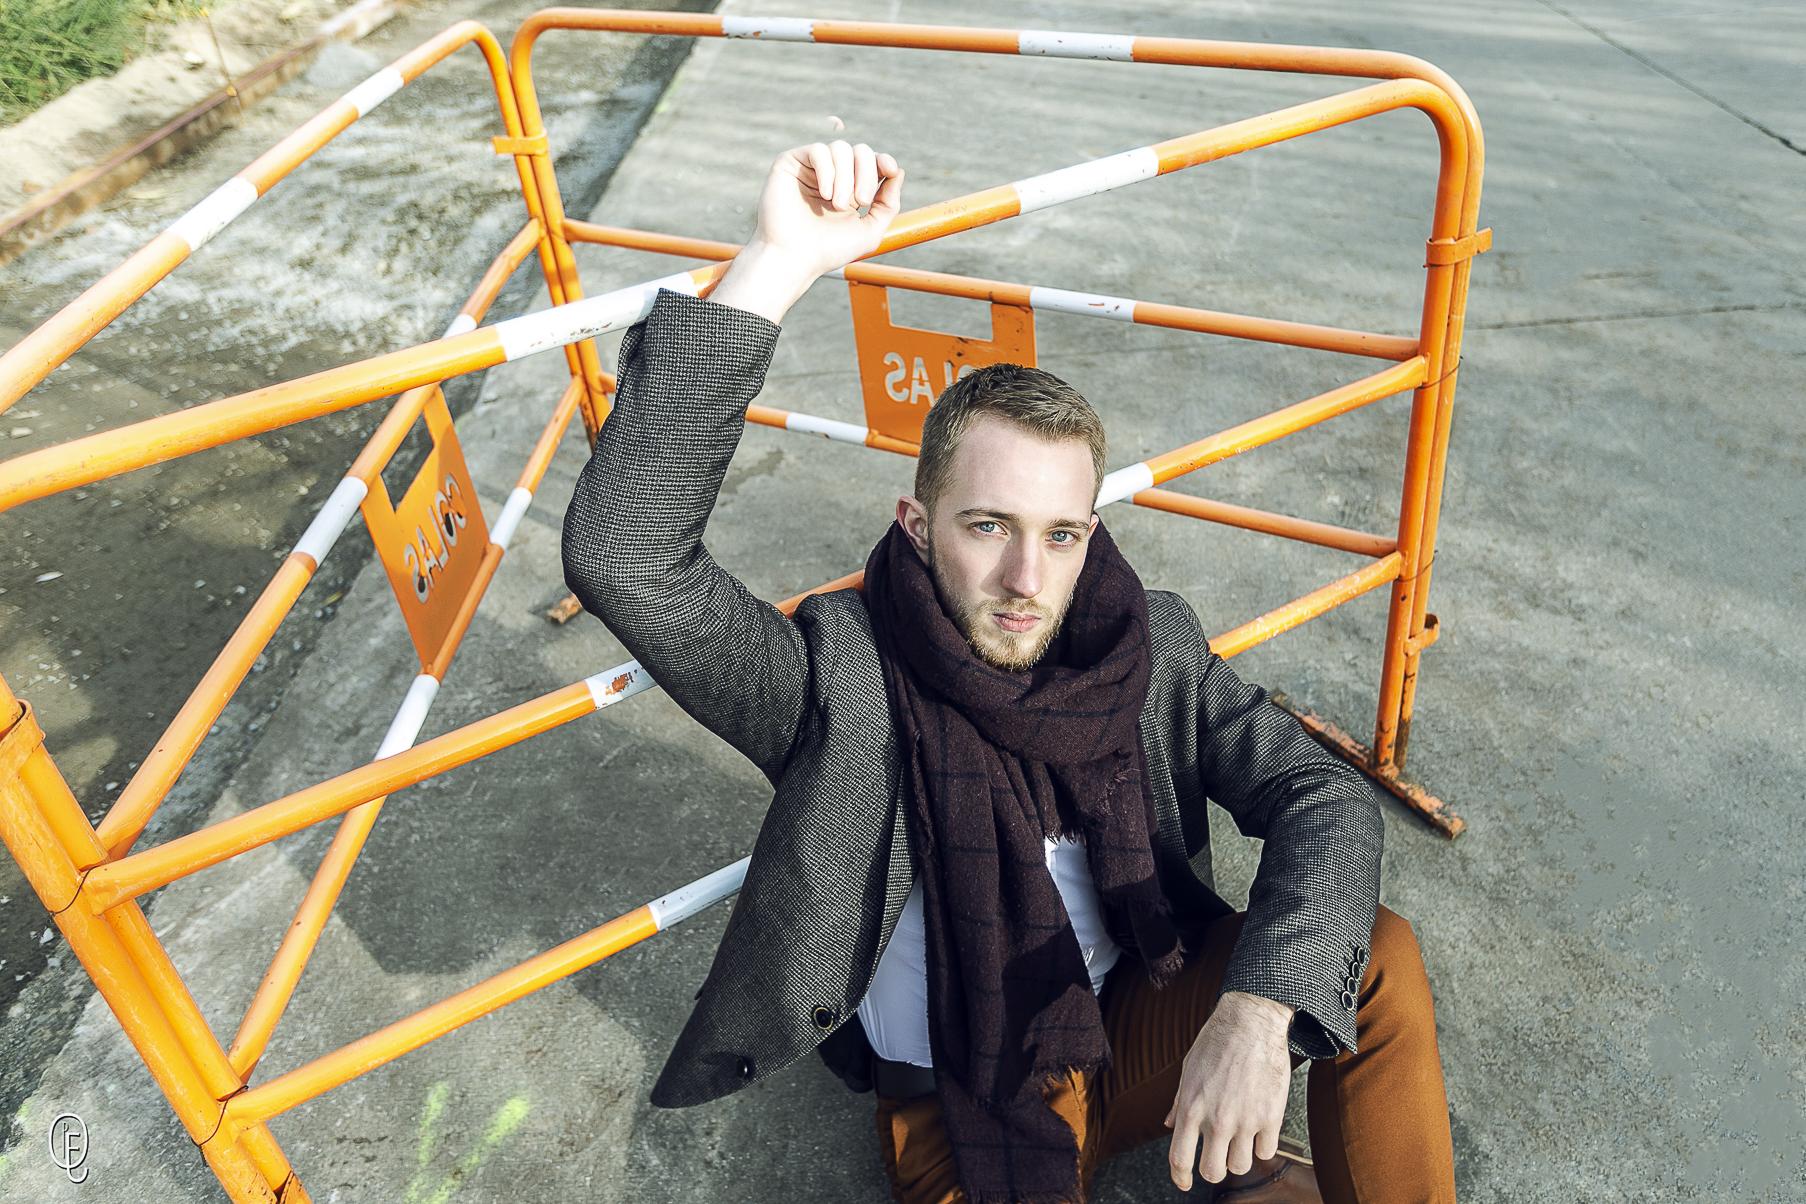 Photographe de Portrait, Photographe Nantes, Photographe de Portrait, Portrait, Portrait Nantes, Séance Photo.